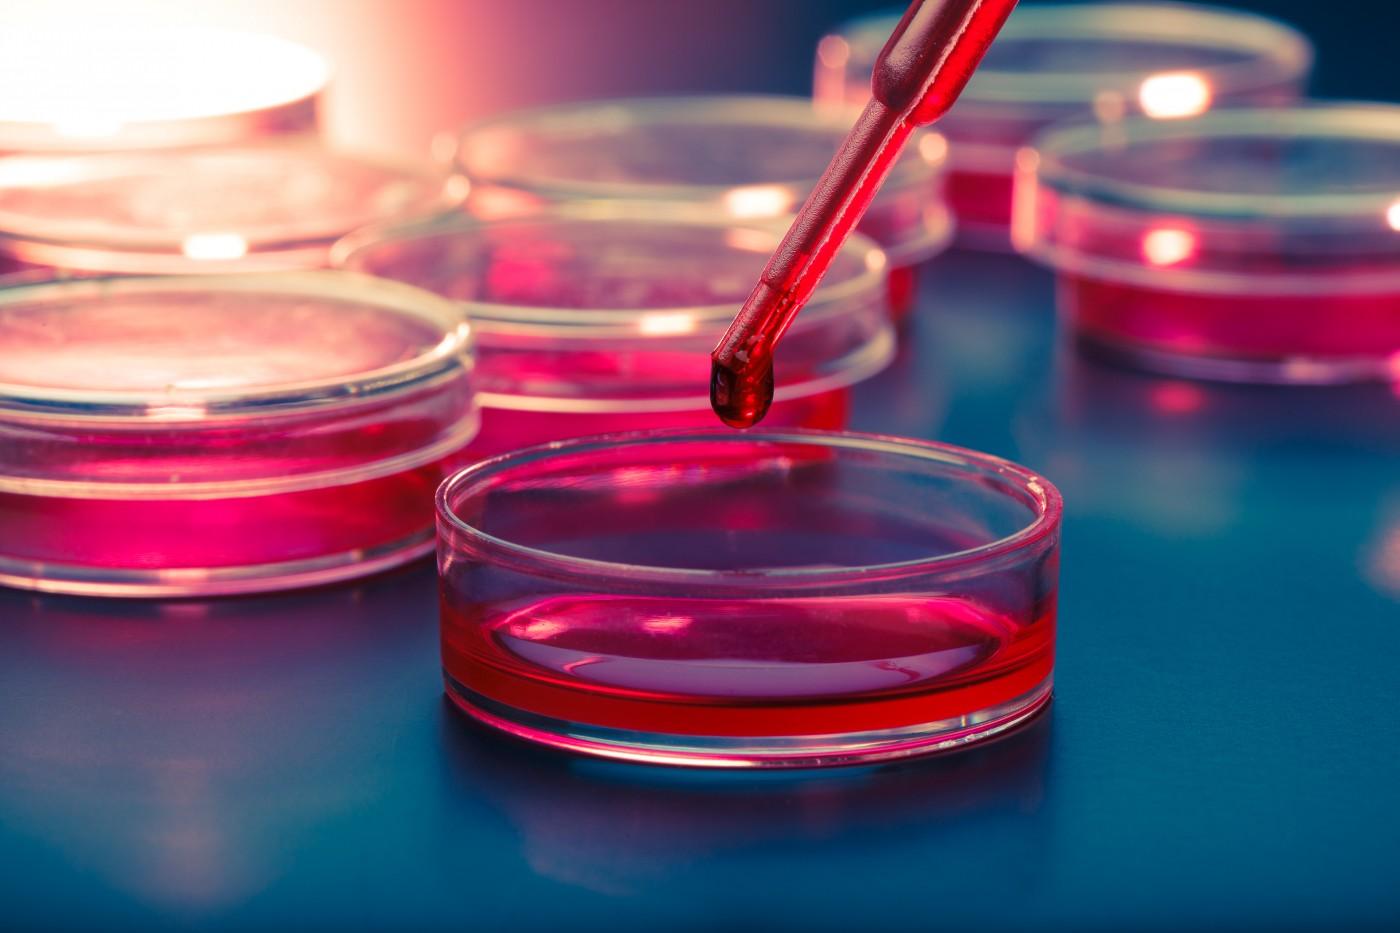 Medicina Regenerativa Utilizaci 243 N De C 233 Lulas Madre Para